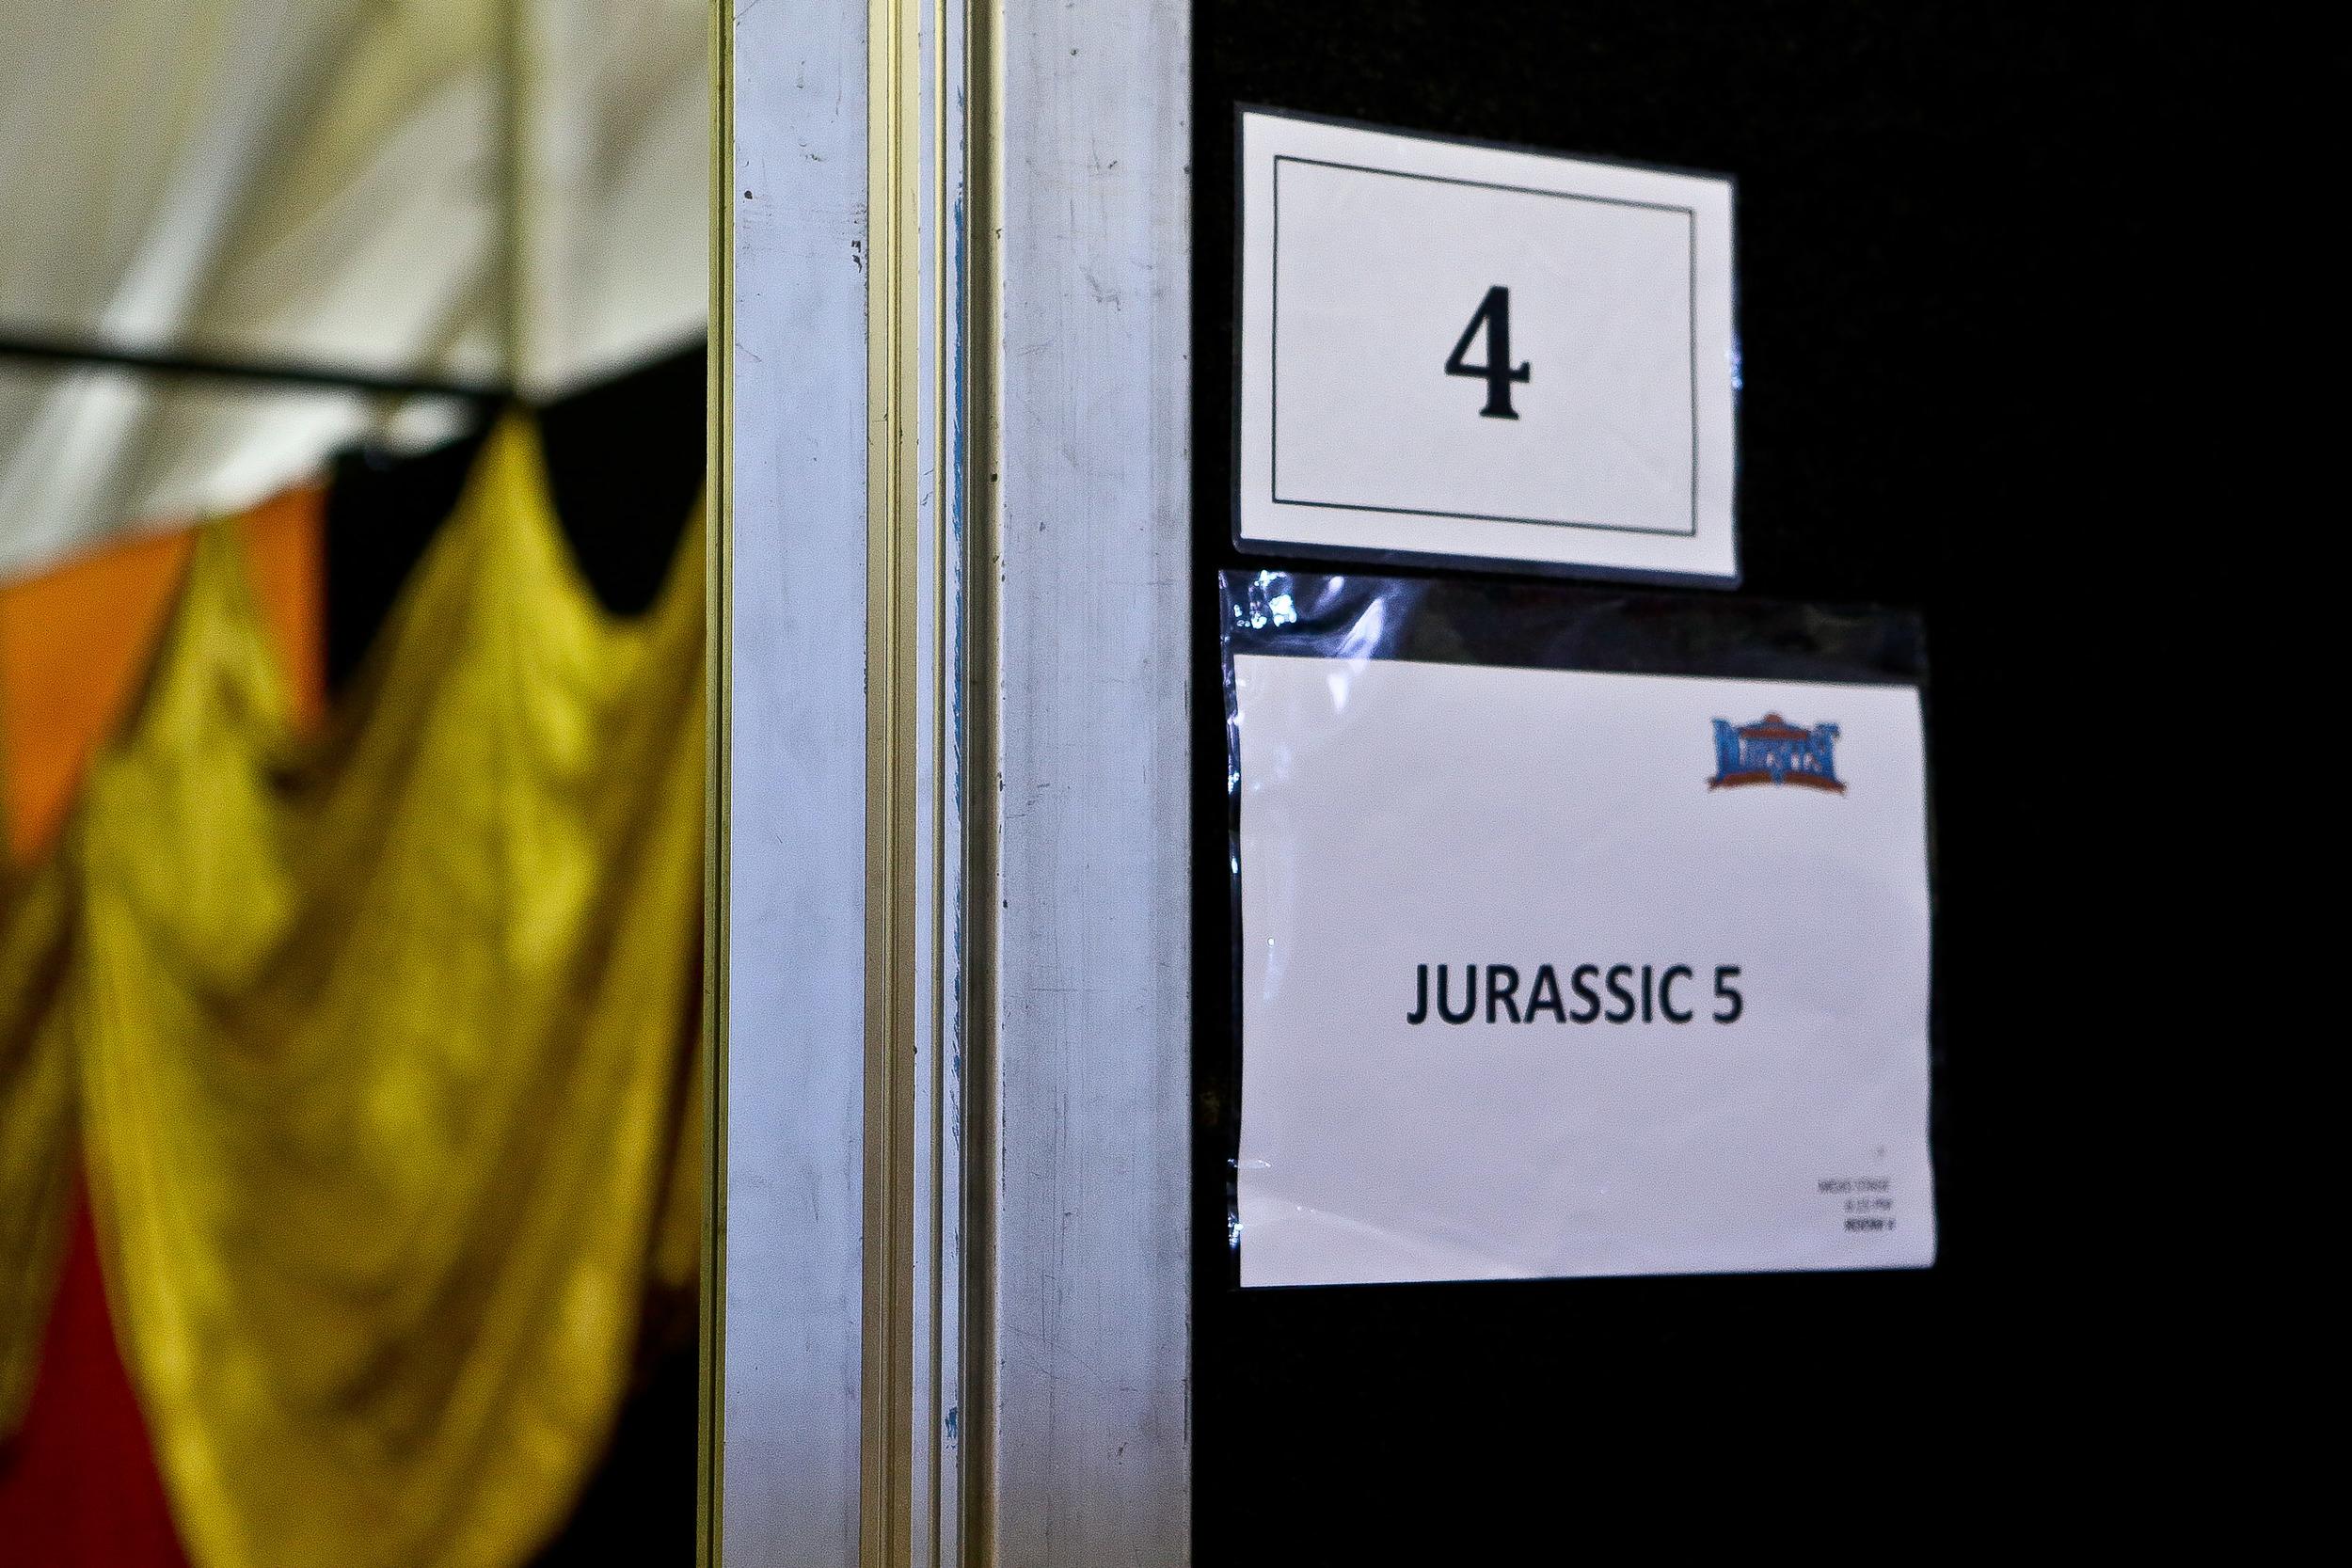 jurassic 5 (backstage)_bluesfest15_josh groom (0).jpg